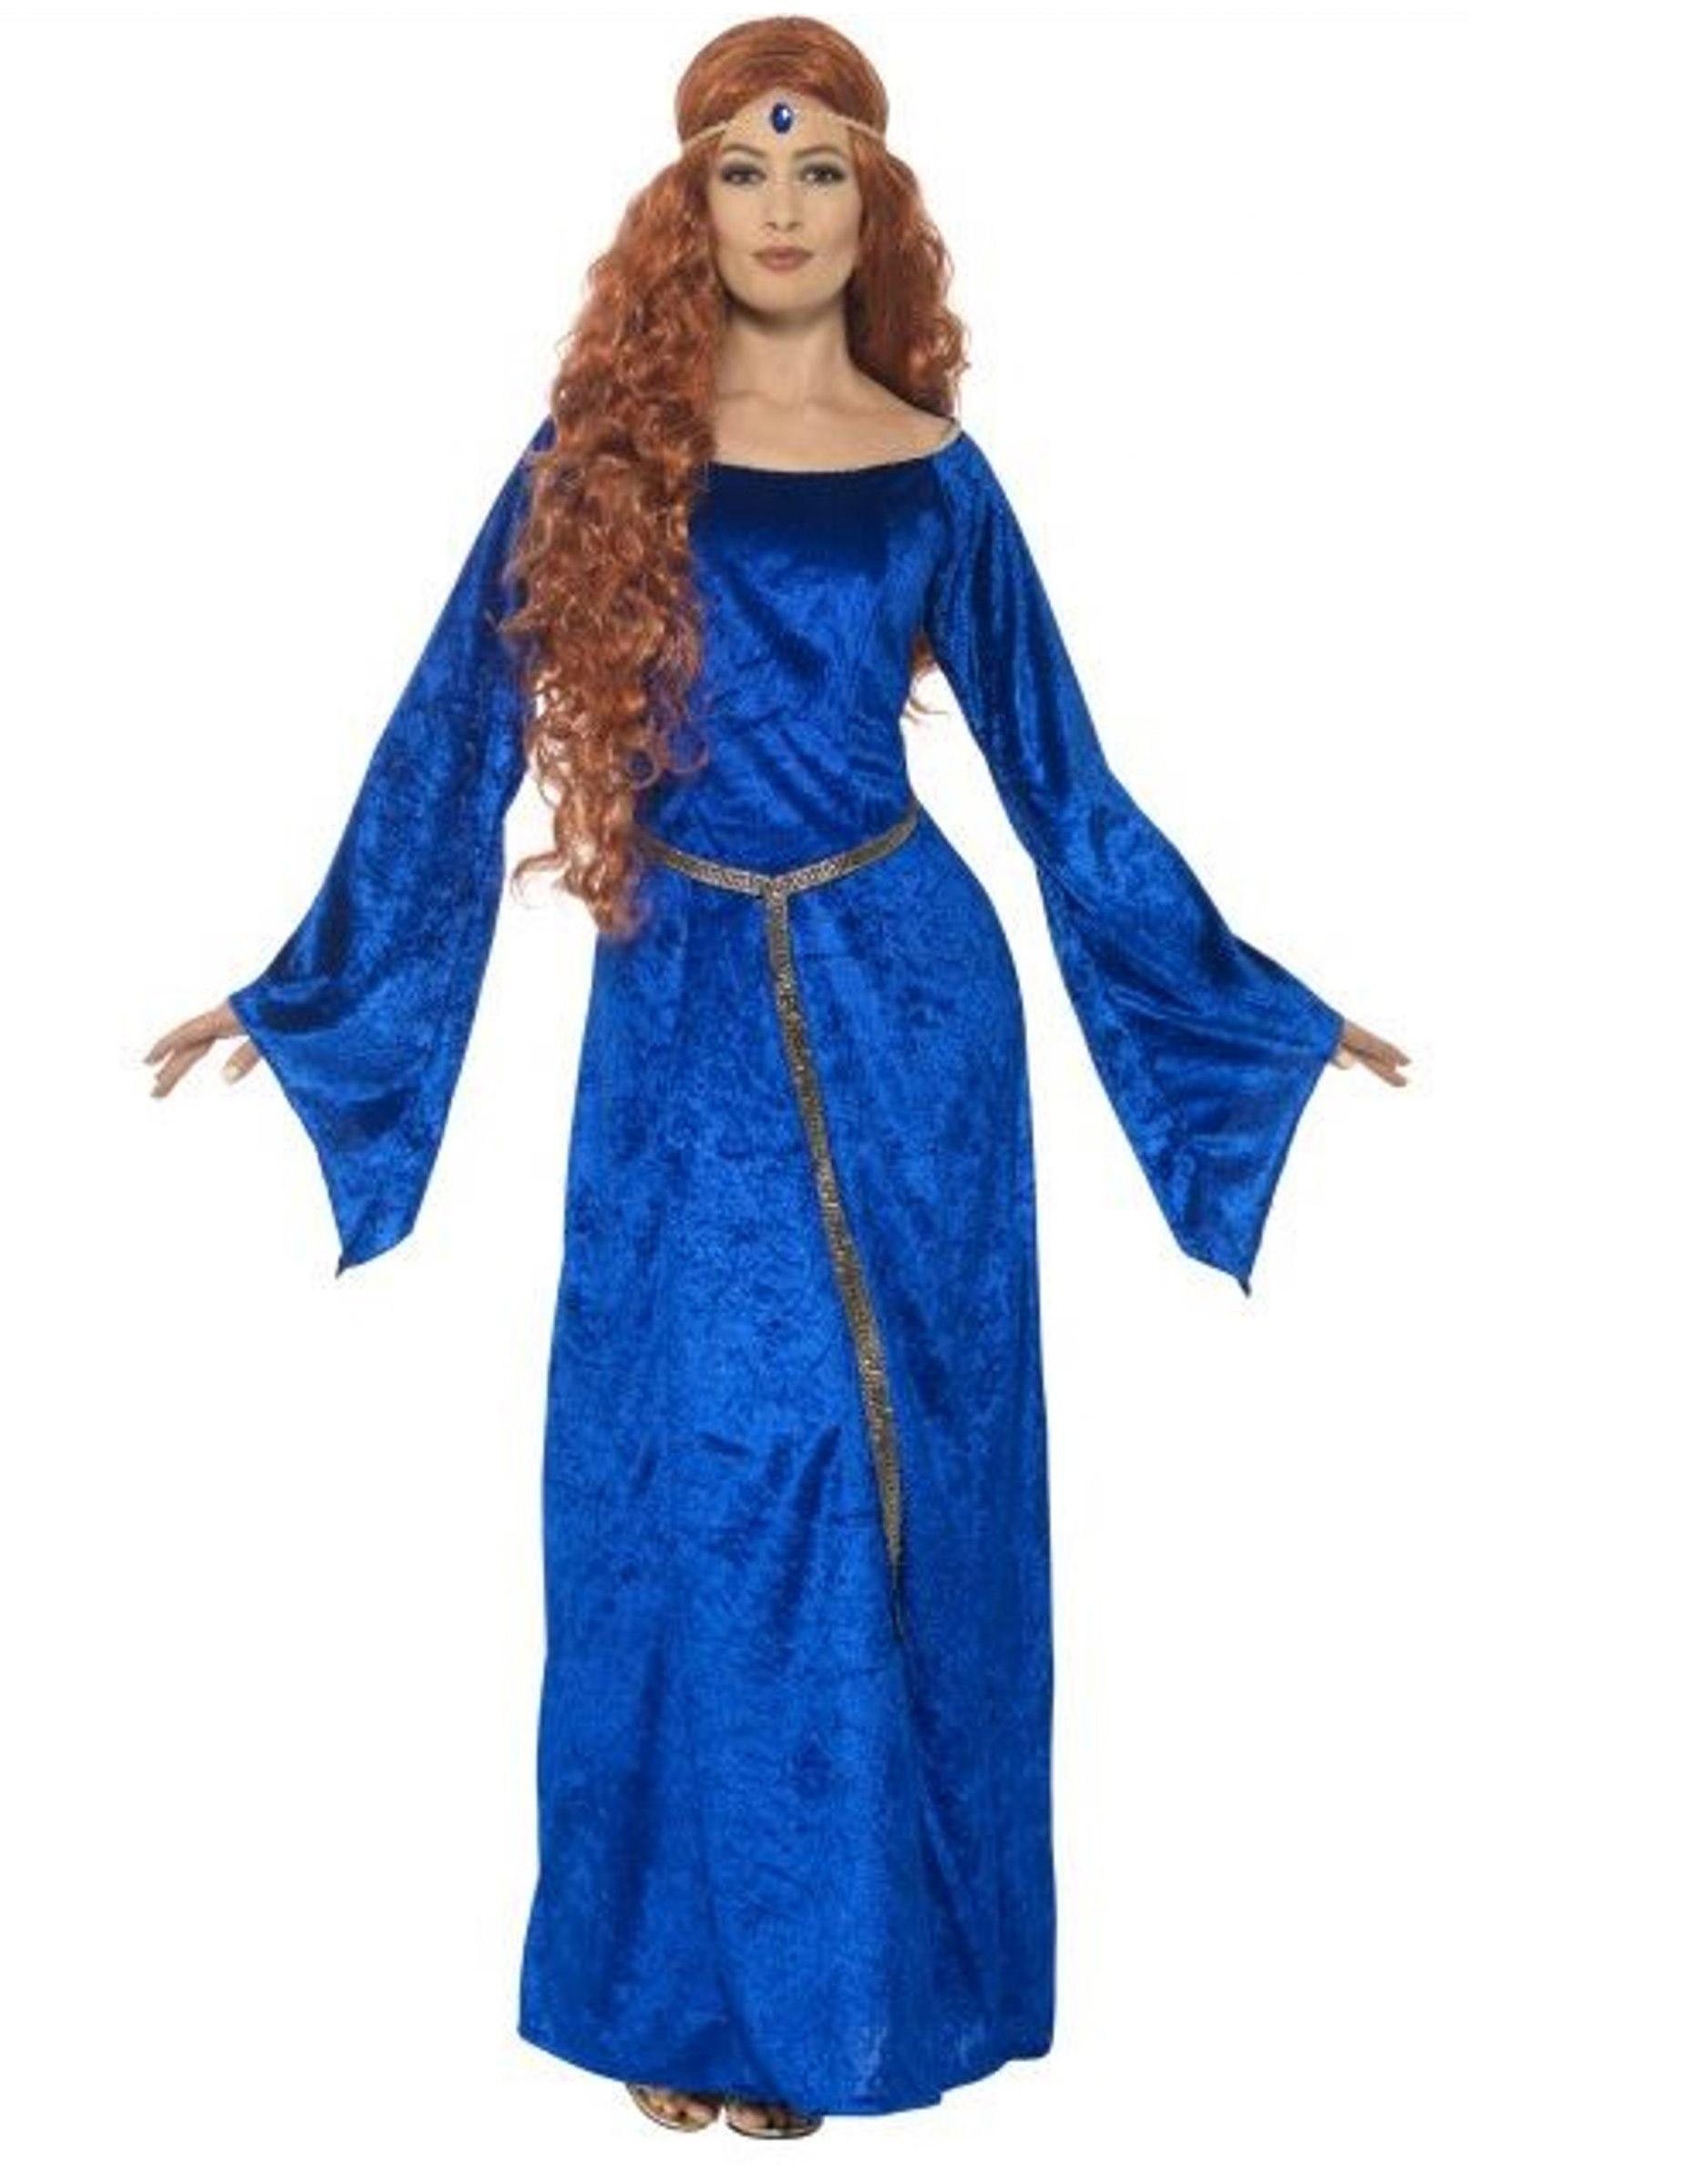 Adulti e Donna Per Travestimento Blu Da Costumi Medievale Dama R0vaT